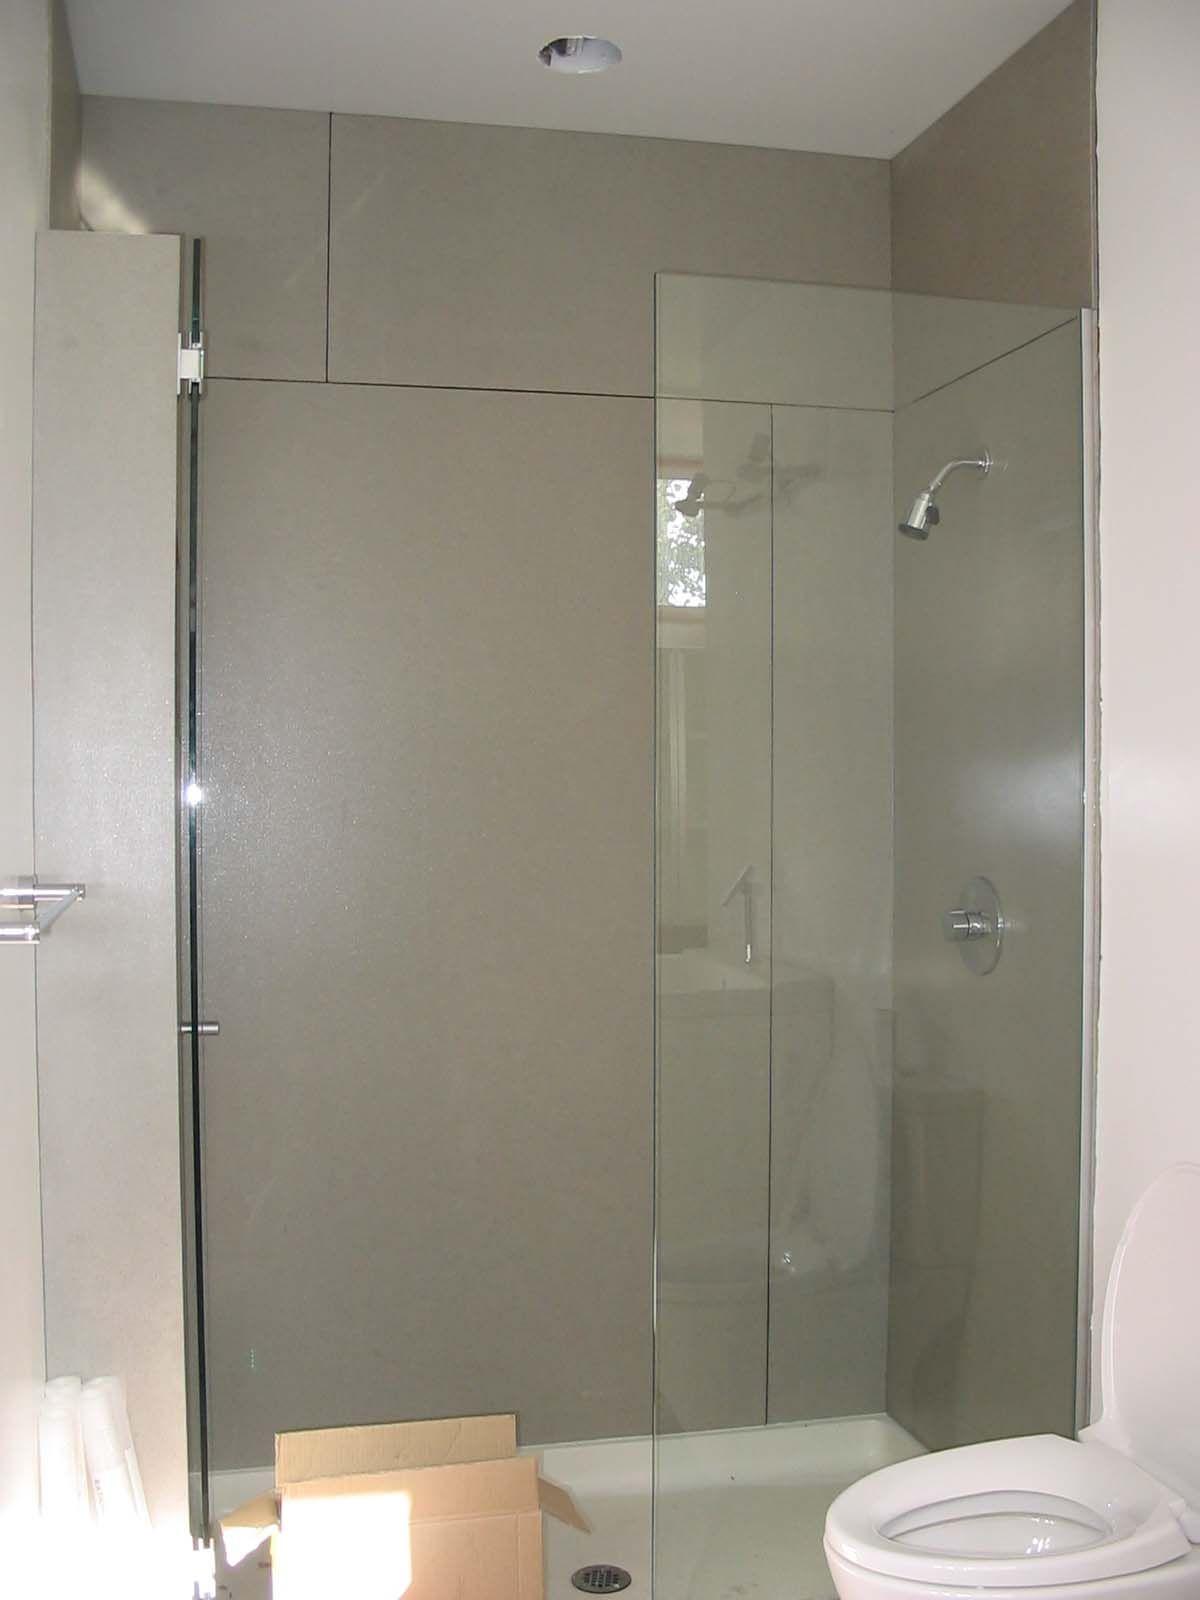 Concrete Shower Walls Any Suggestions Bathroom Redo